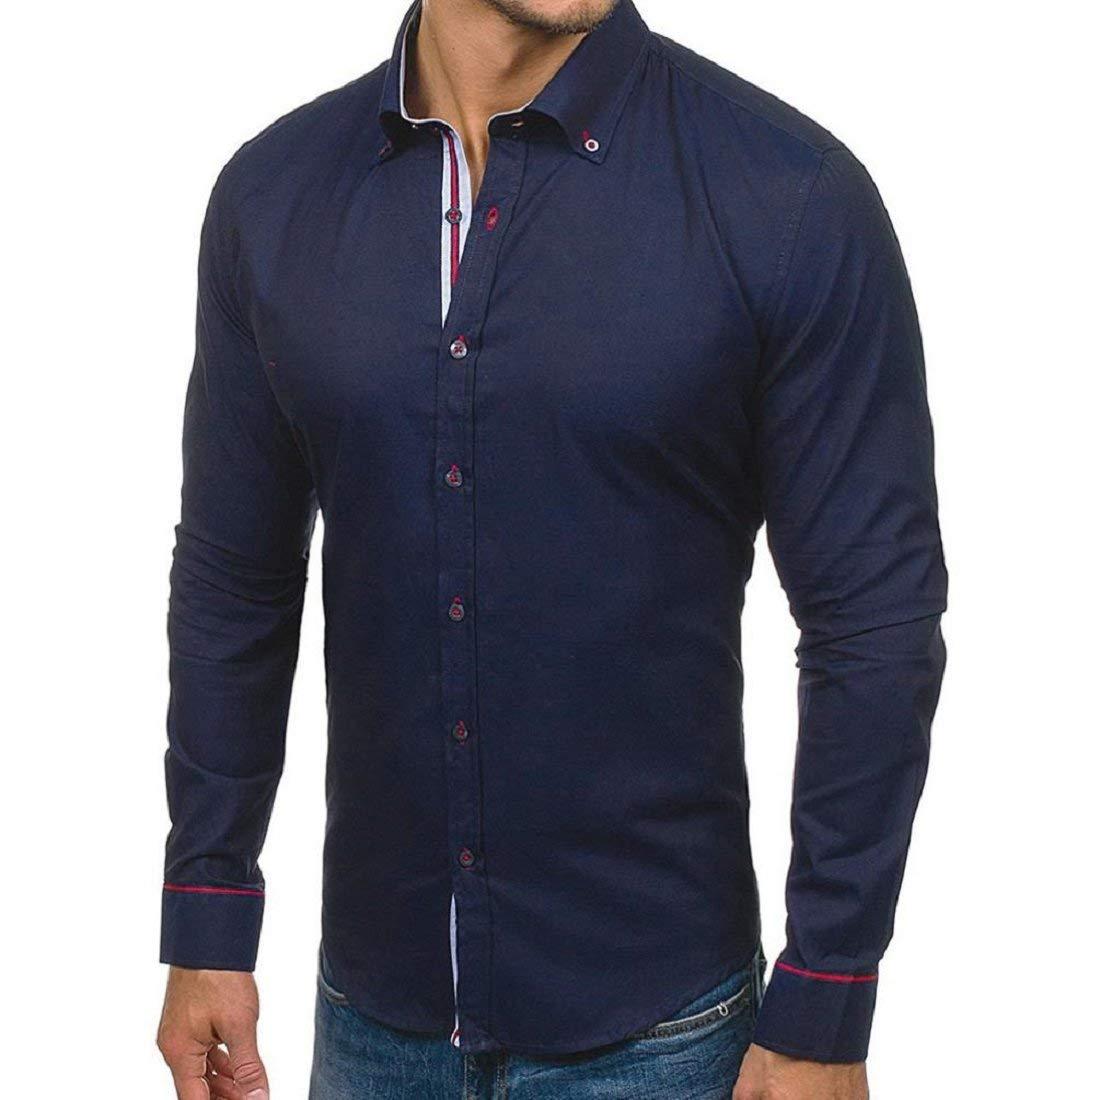 35b4144980a8 Get Quotations · GONKOMA Mens Shirts Men's Long Sleeve Shirt Casual Solid Slim  Fit Dress Shirt Stand Collar Shirt